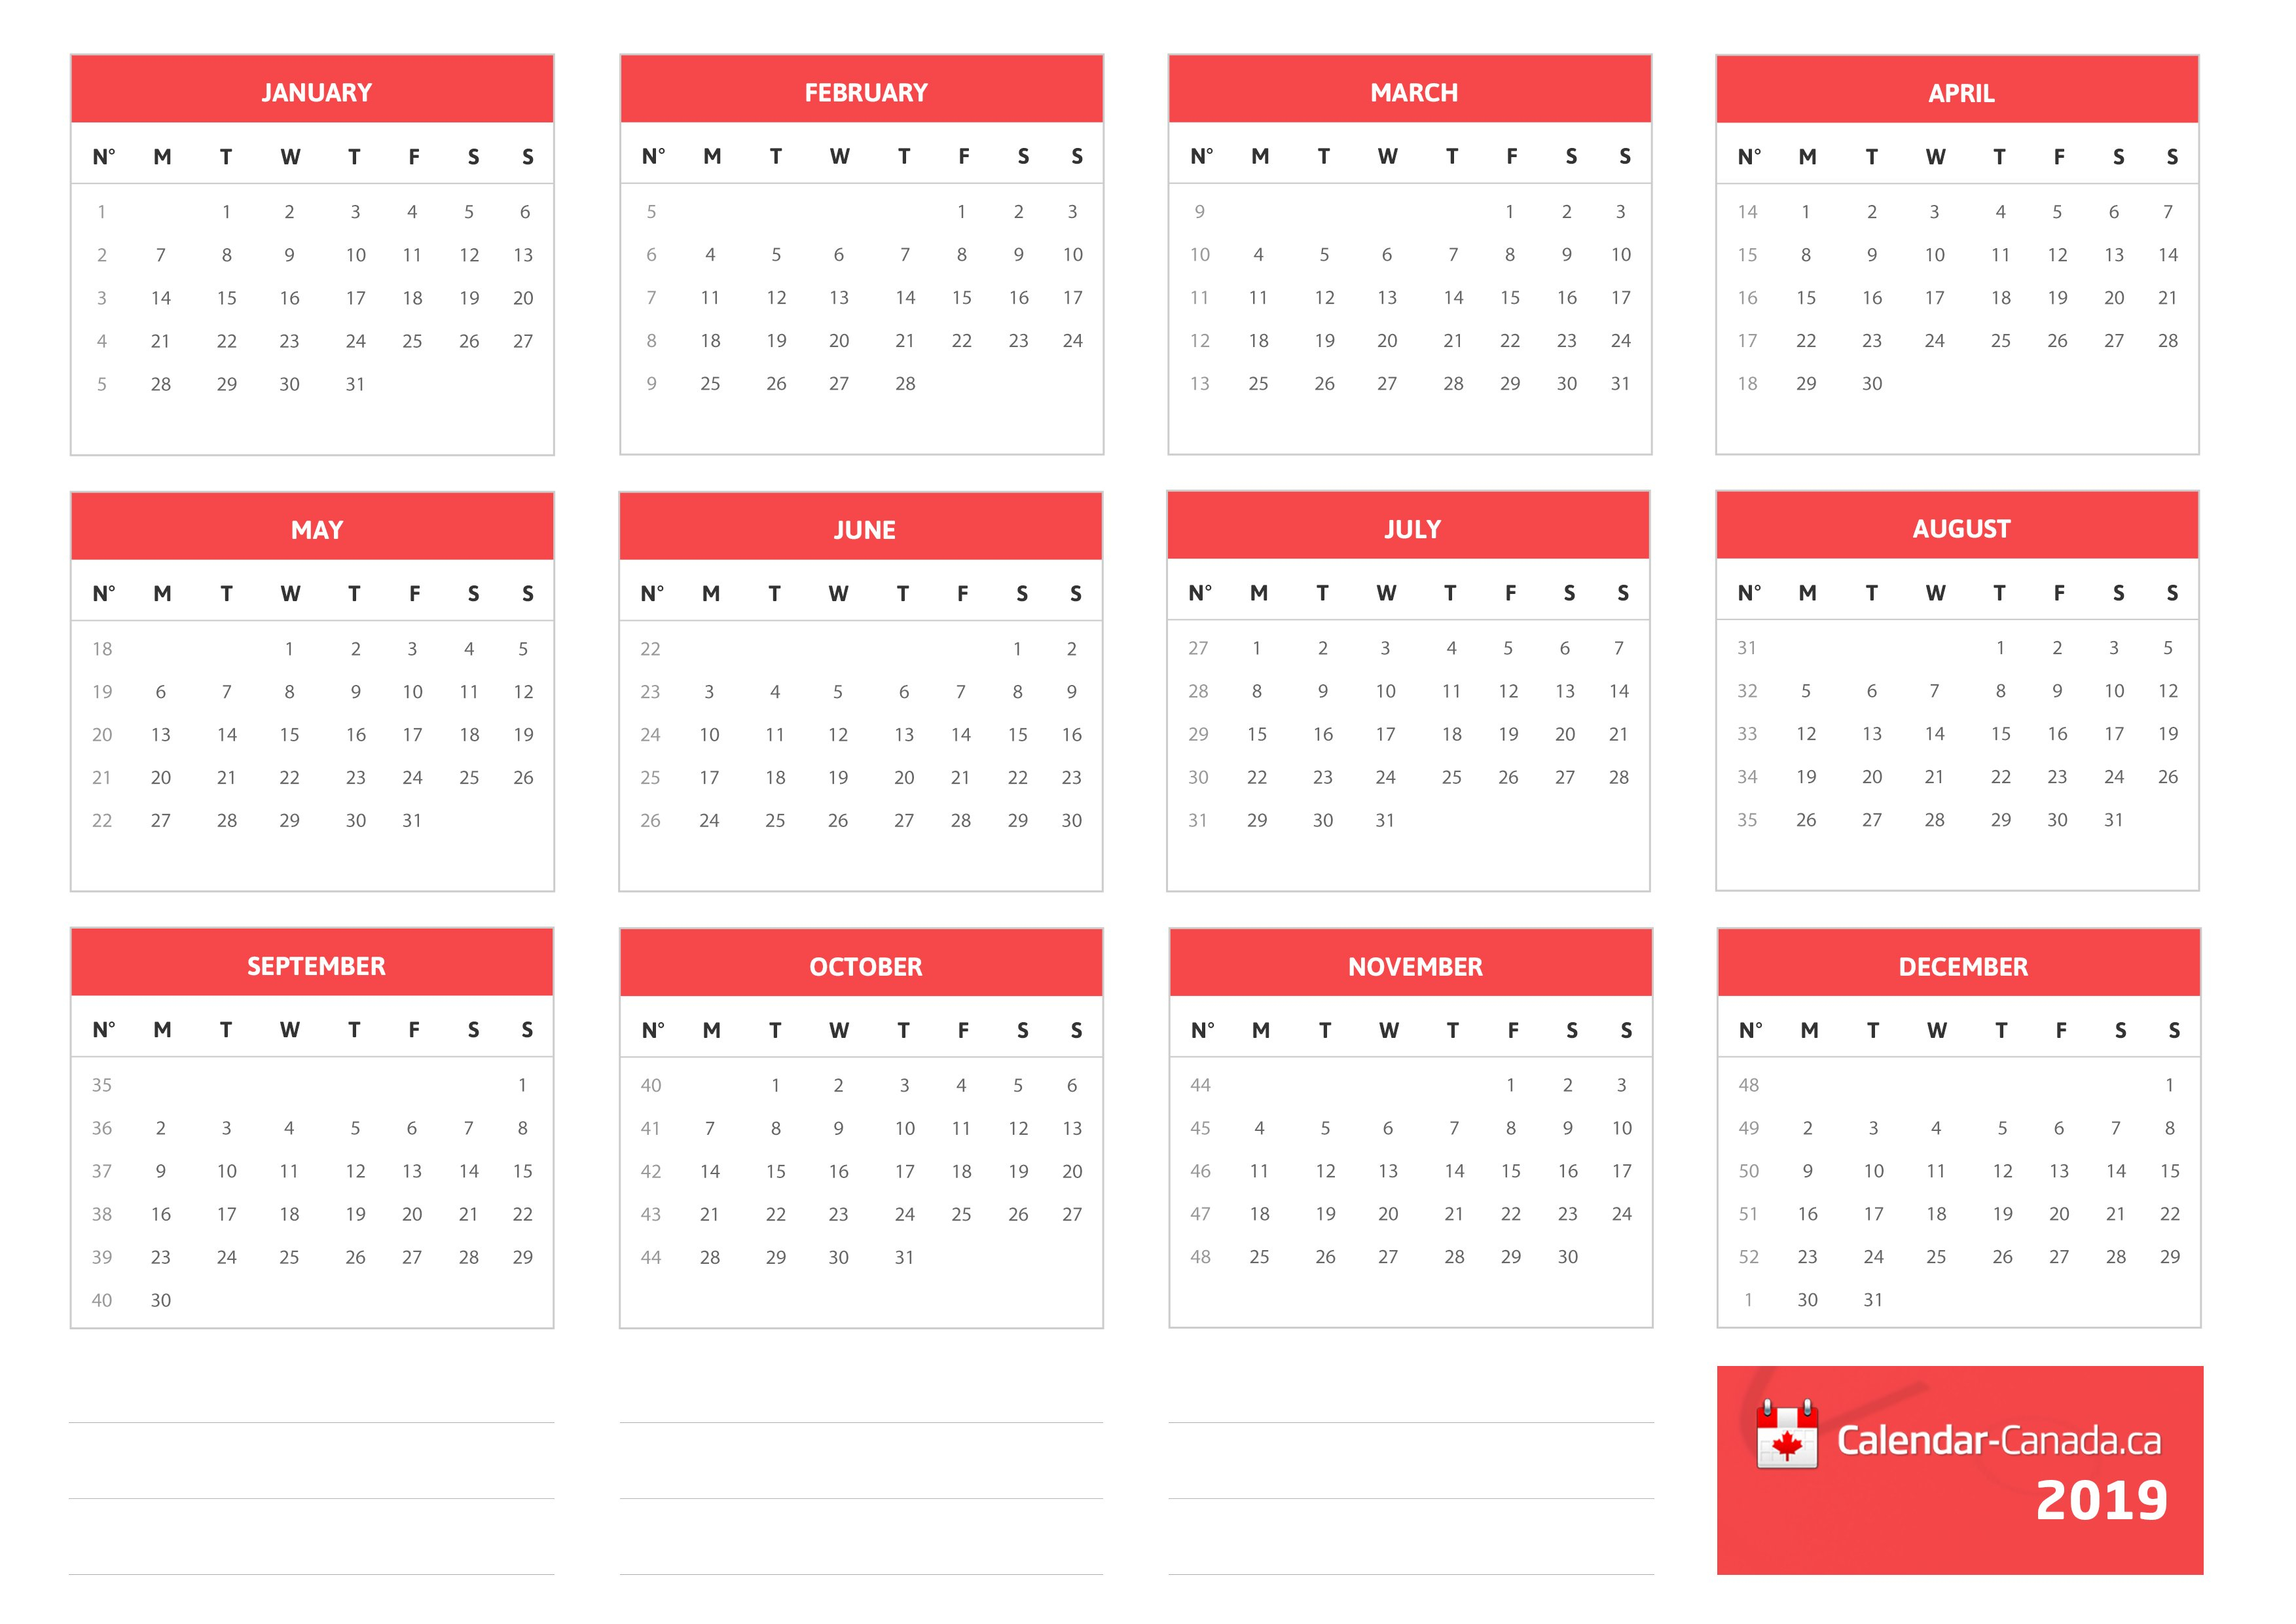 2019 Calendar Canada Calendar 2019 Canada